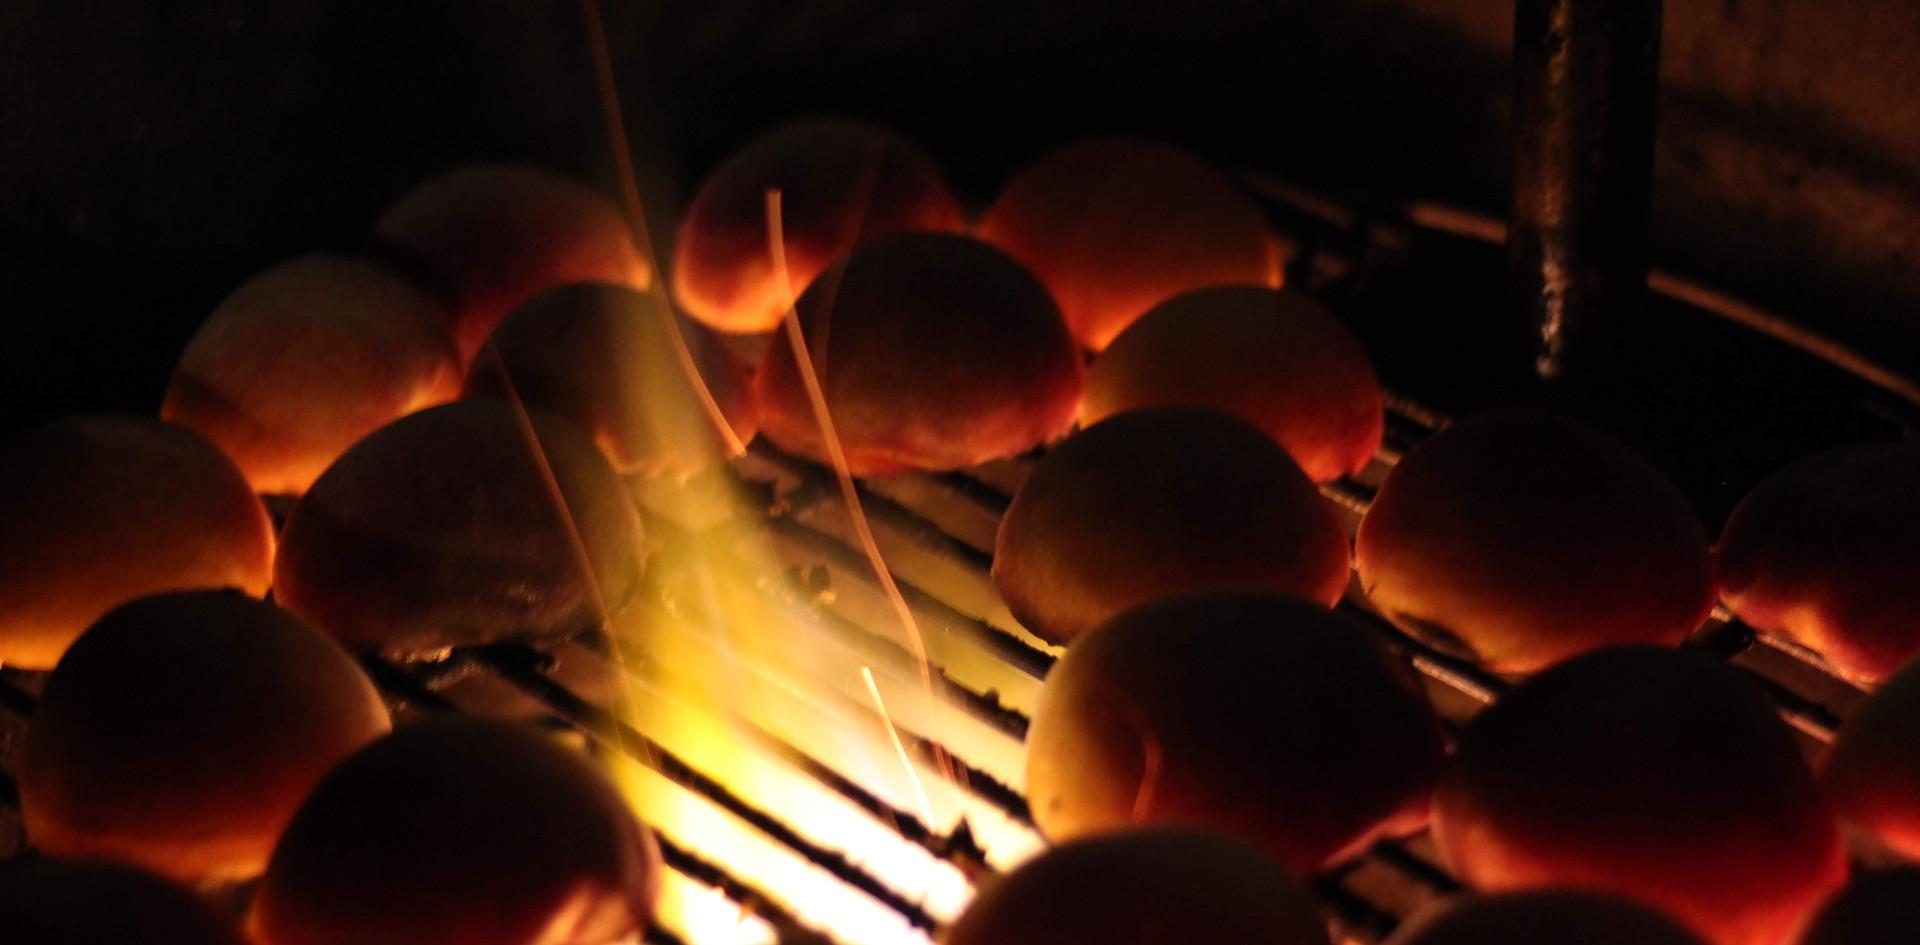 leprechauno-peaches-on-the-grill-4.jpg